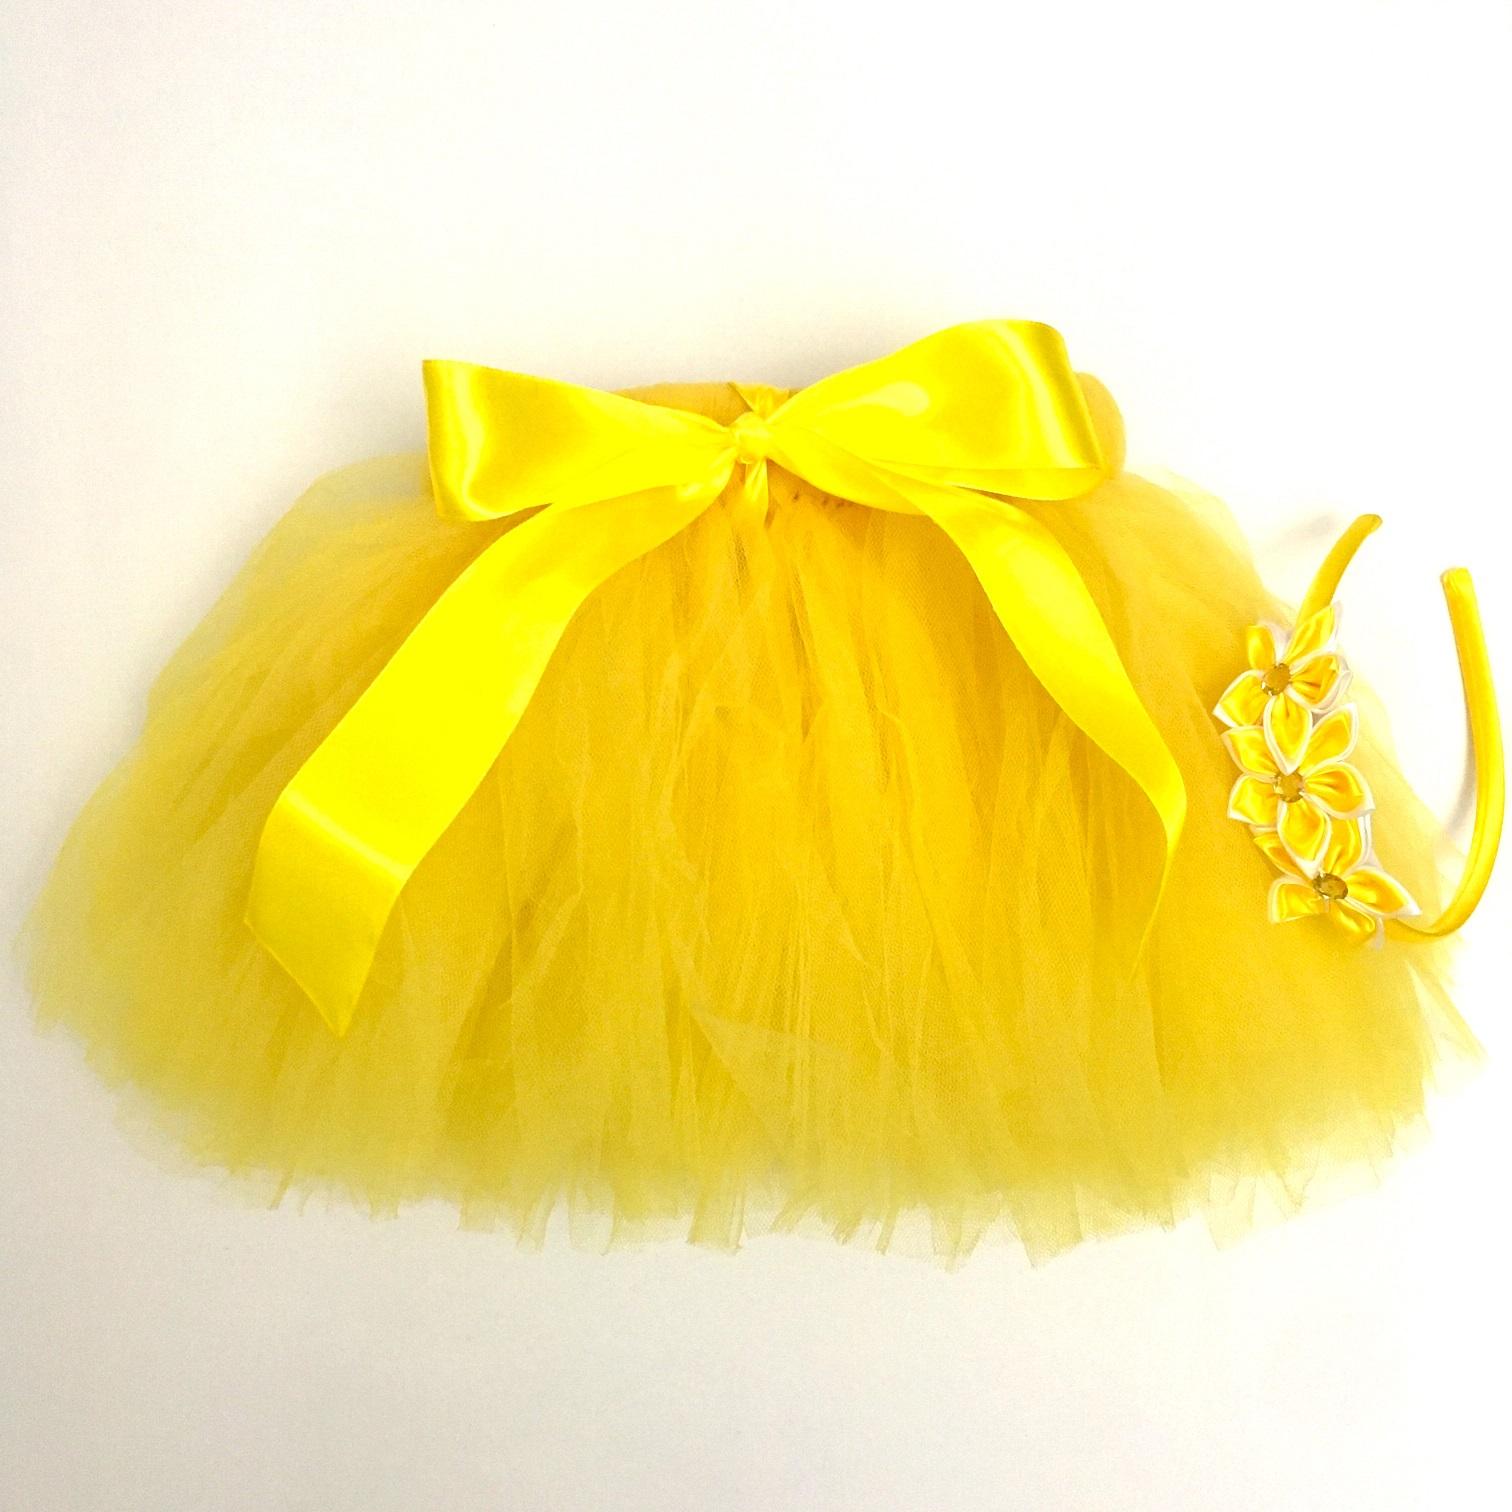 2ae6a260d33 Tutu suknička žltá (1-3 roky) - jupitershop.sk